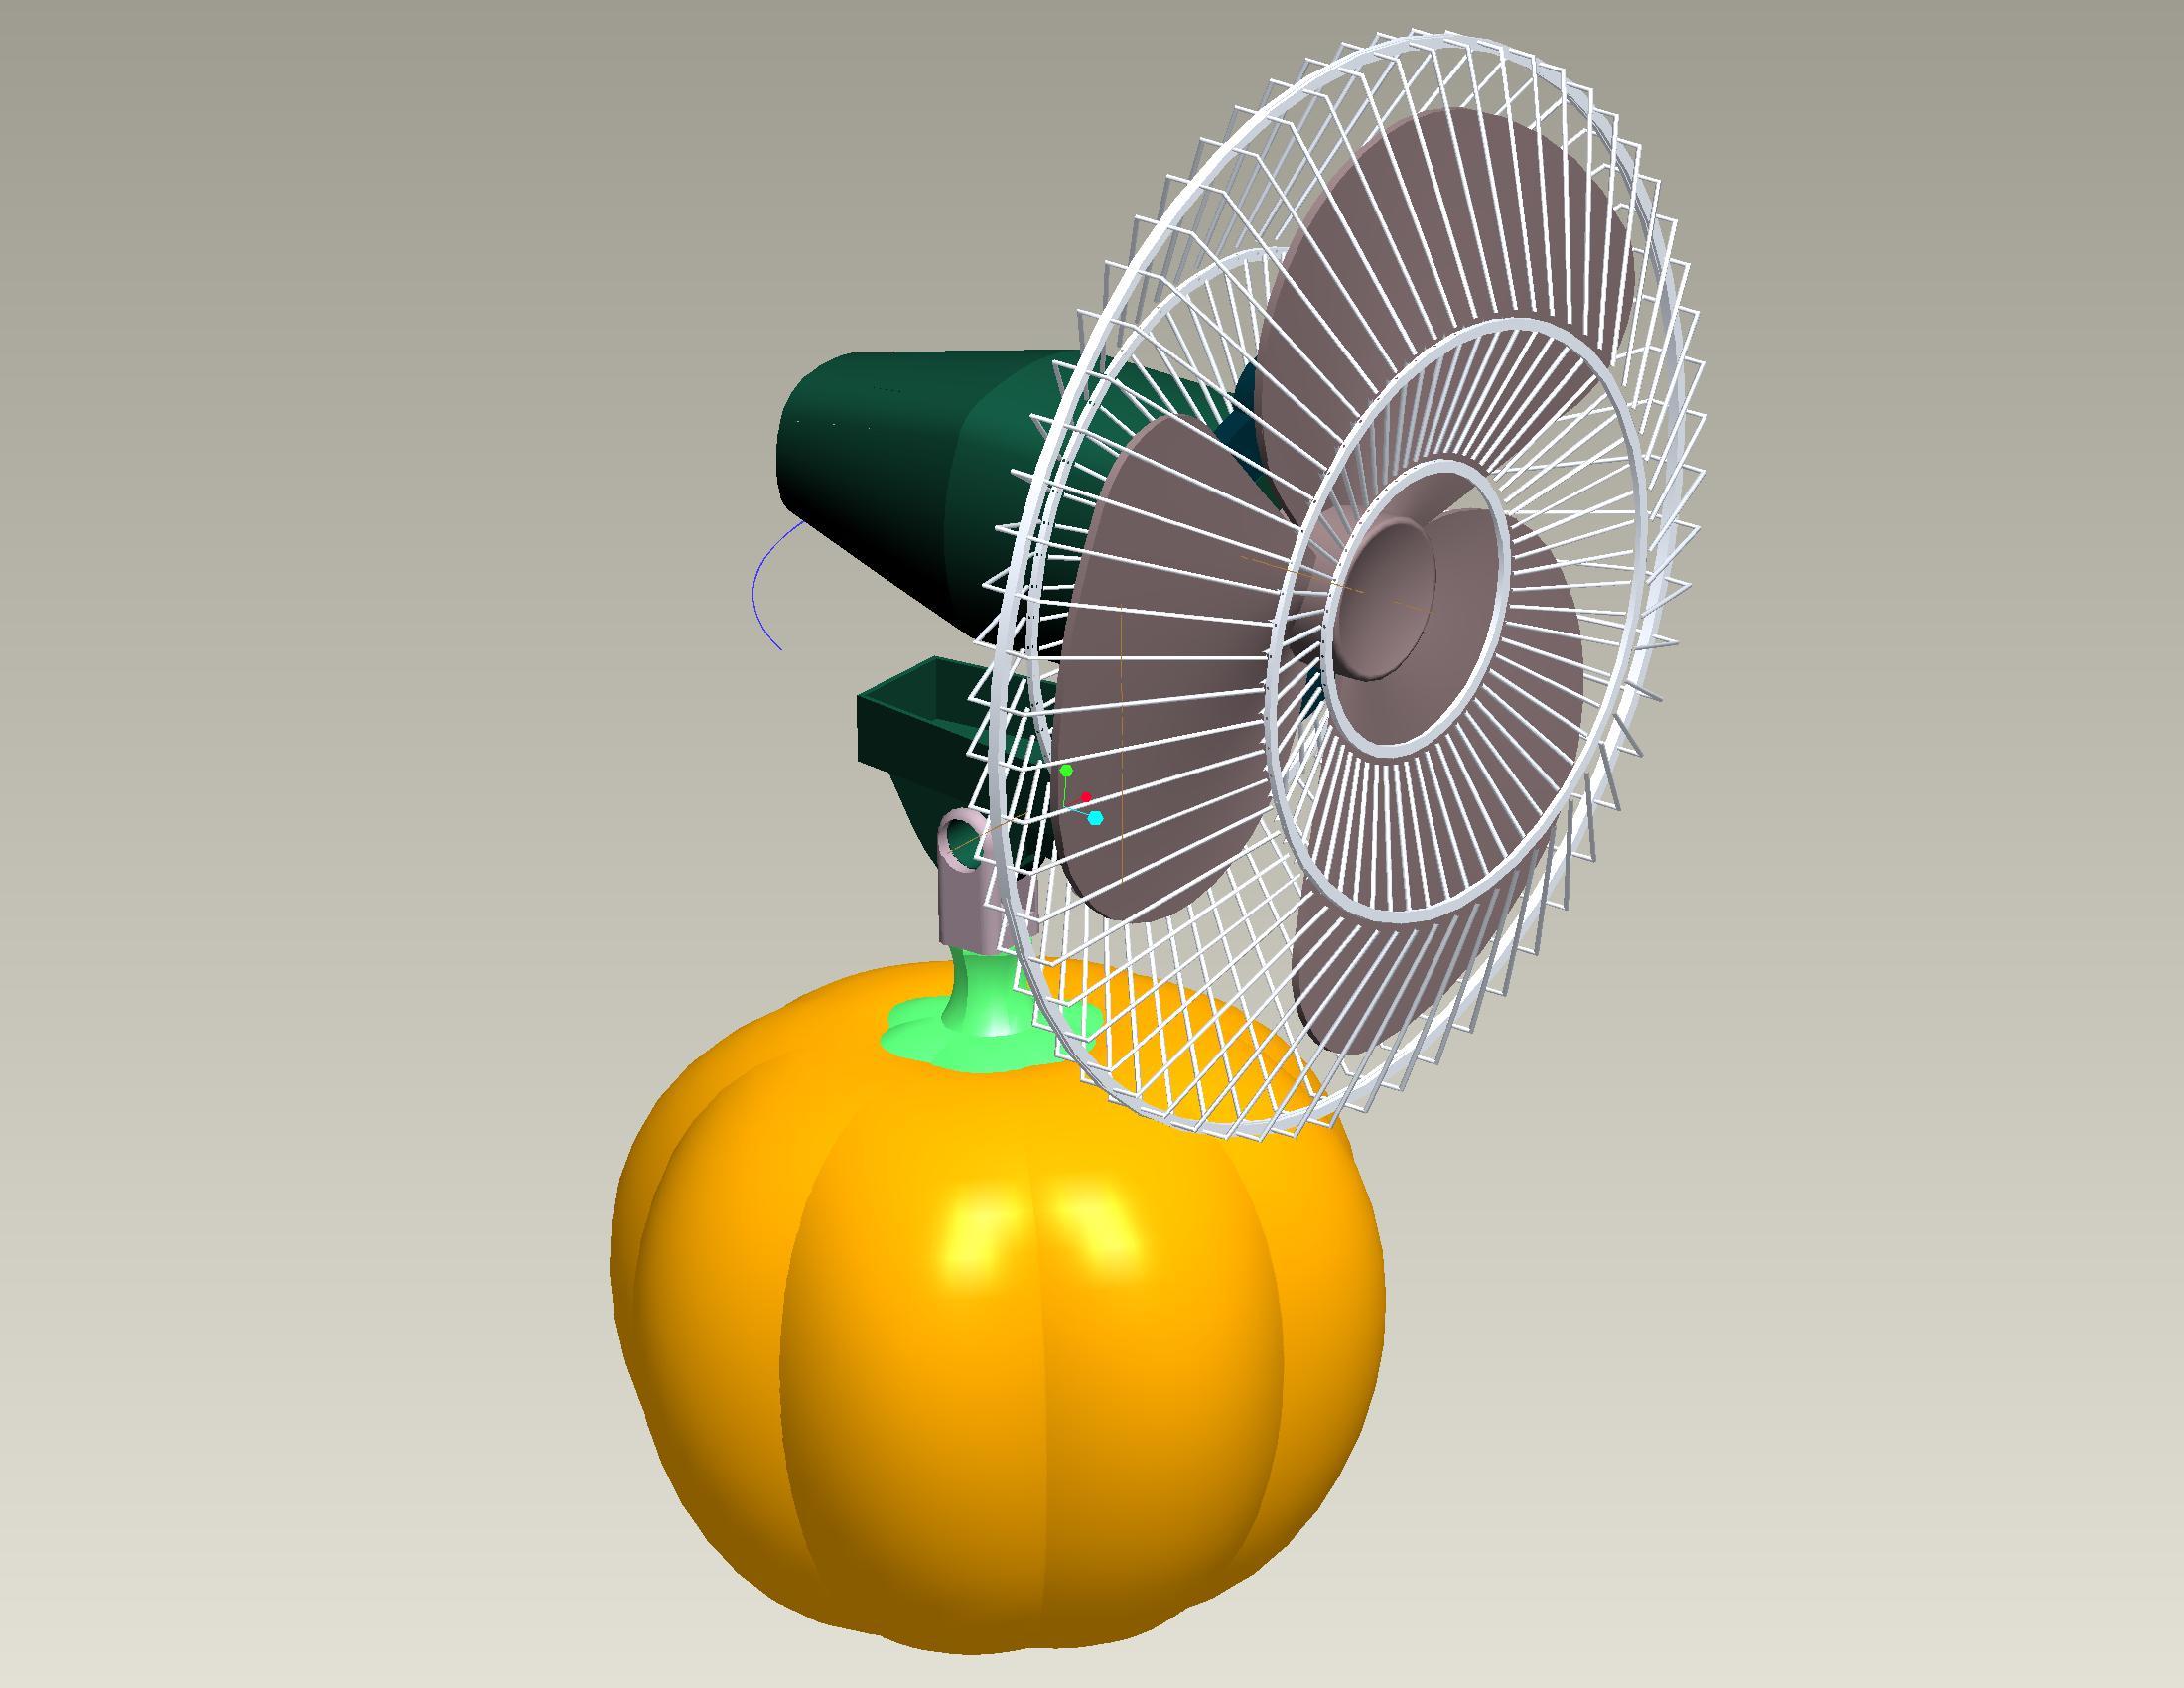 CAD软件技术接待交流区proe电风扇组件与动财务学习台cad图片